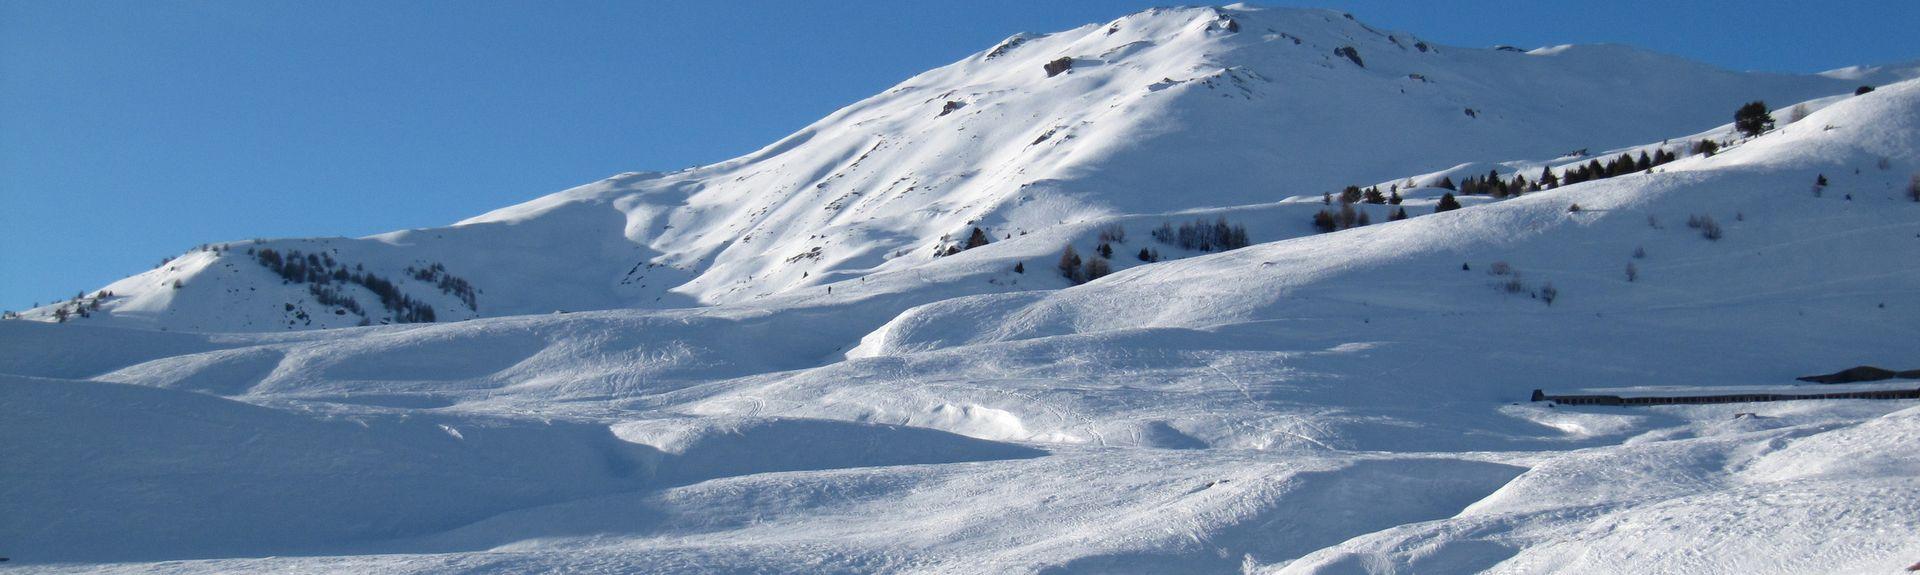 Cogne, Valle d'Aosta, Italië